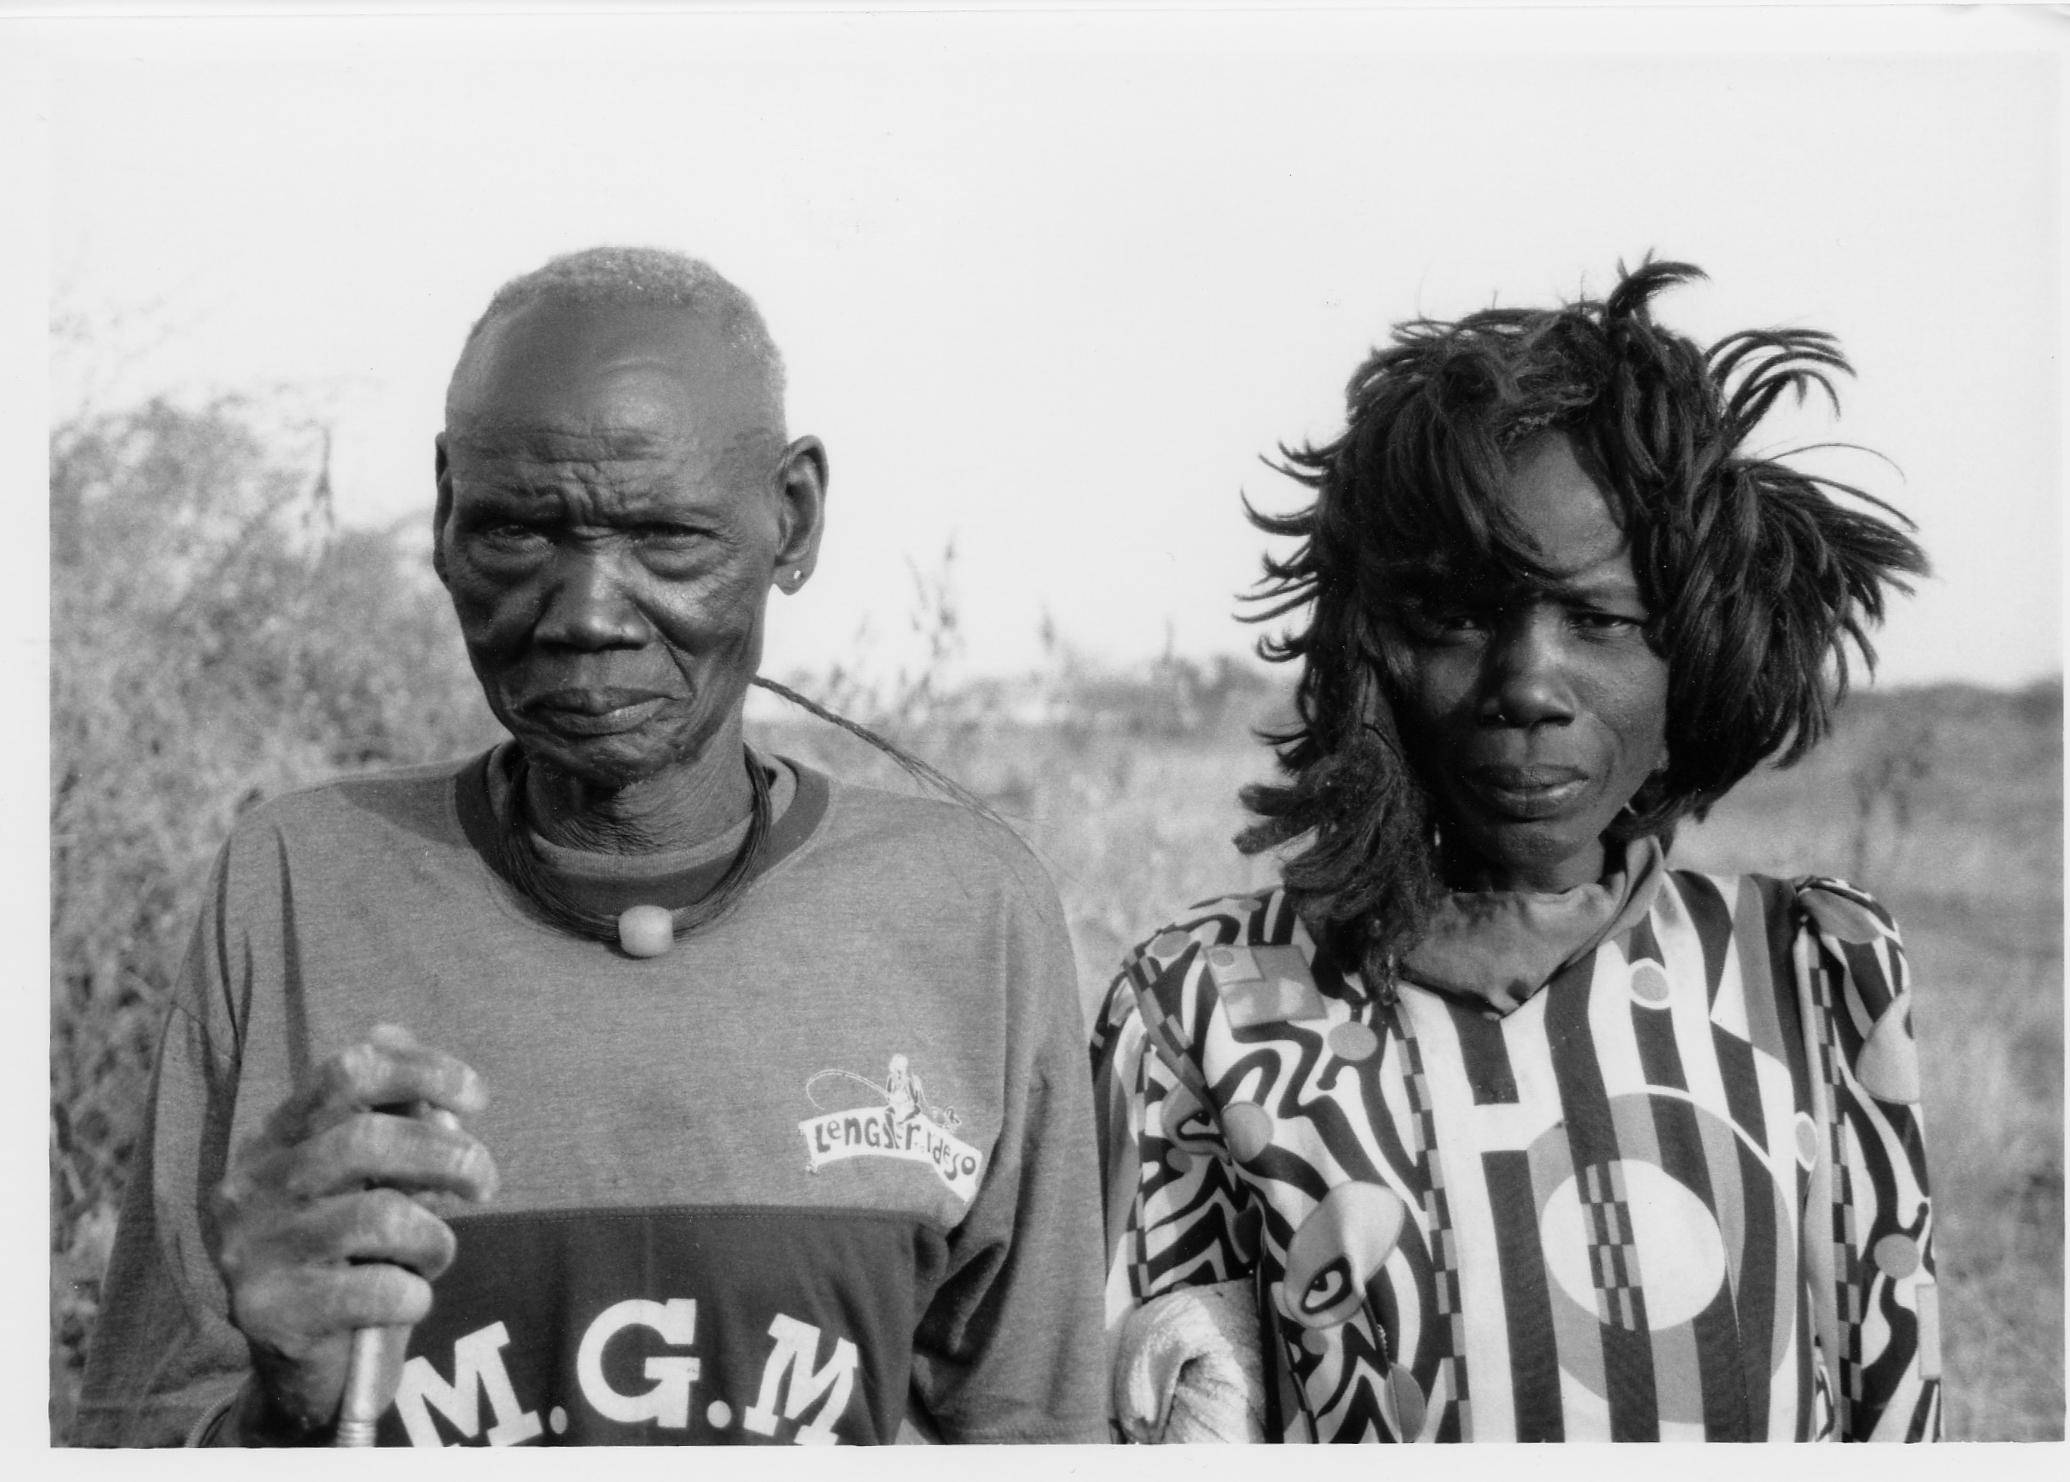 Bad hair day, Sudan